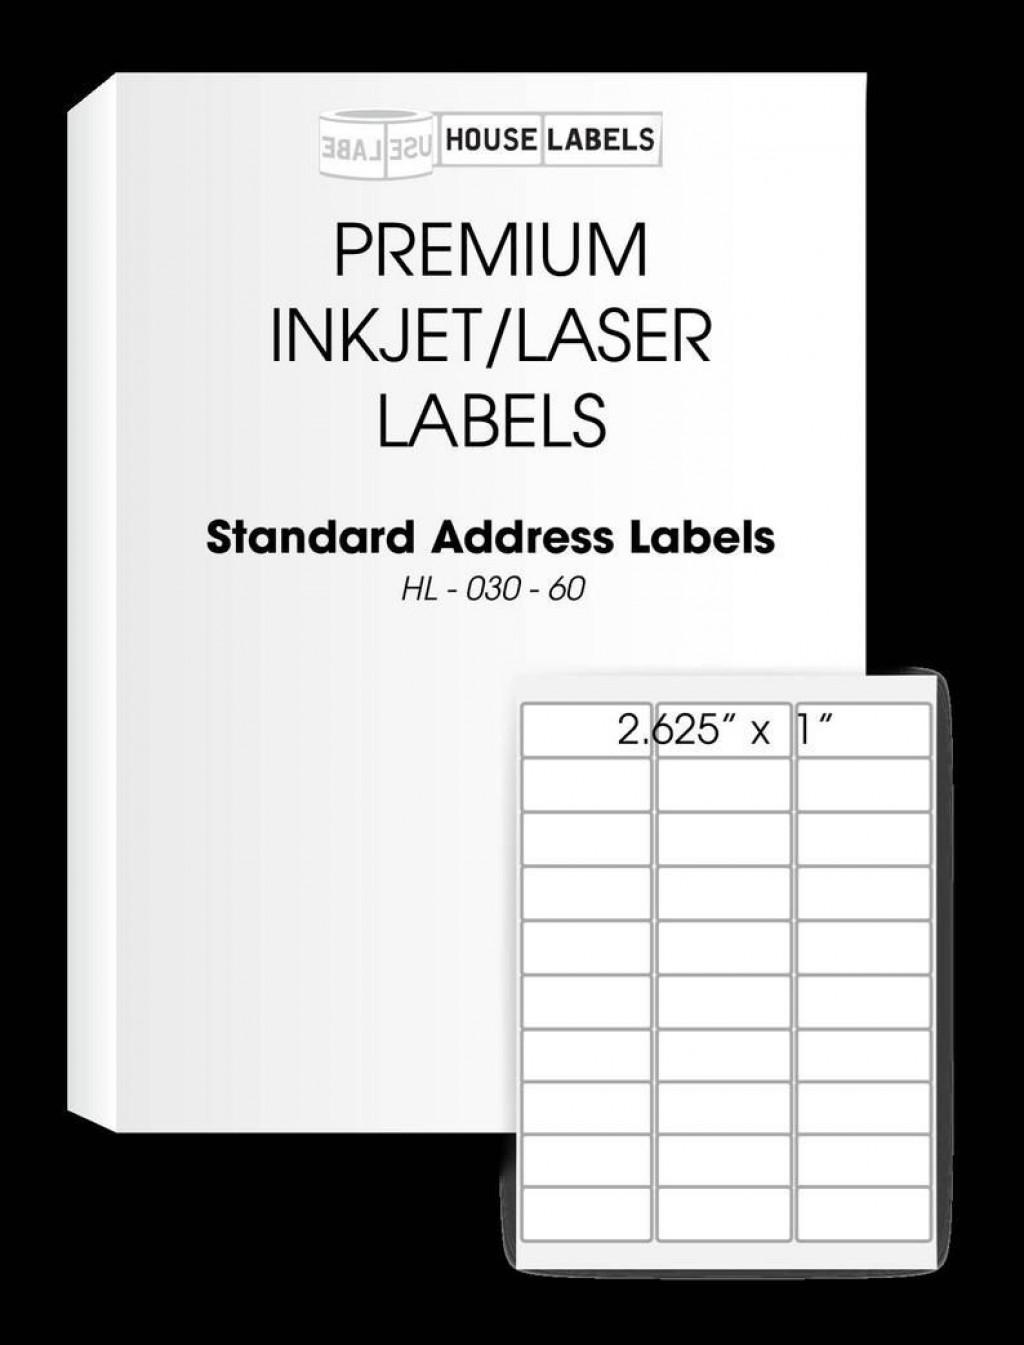 008 Unbelievable Free Return Addres Label Template 60 Per Sheet High Resolution Large